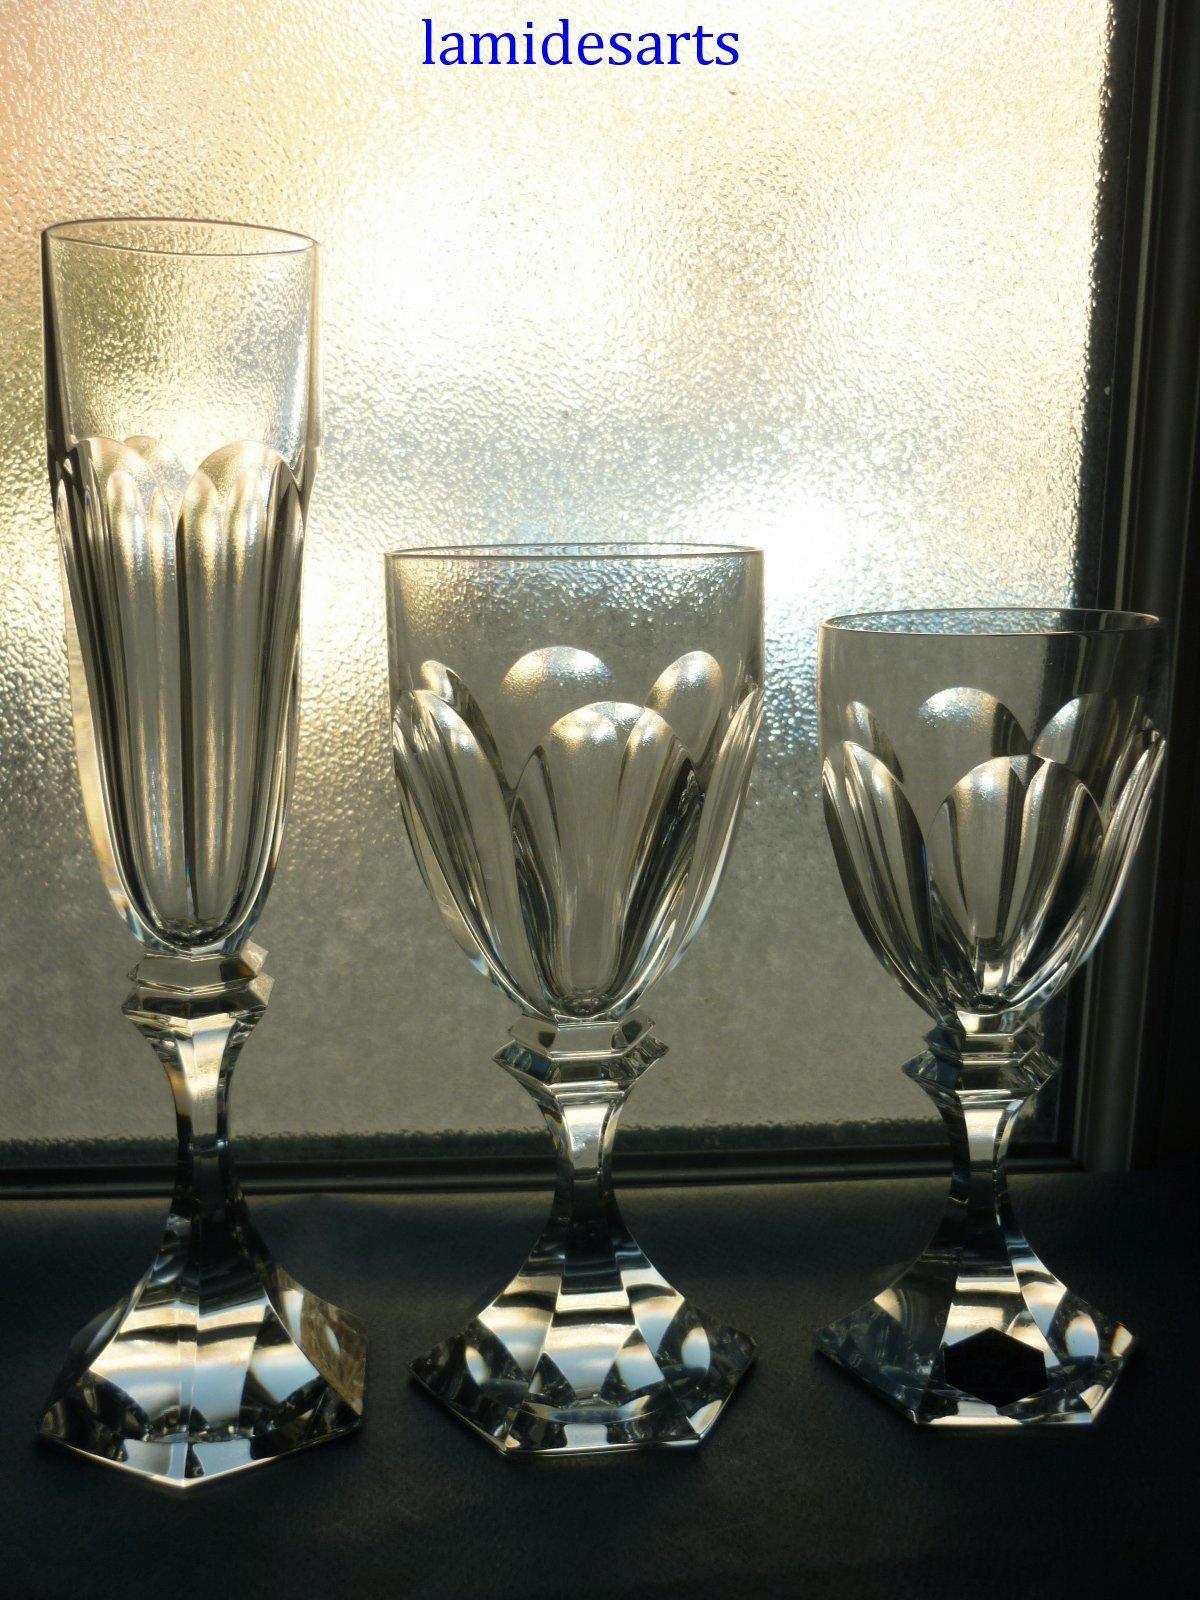 cristal saint louis chambord flute a champagne stock 0. Black Bedroom Furniture Sets. Home Design Ideas